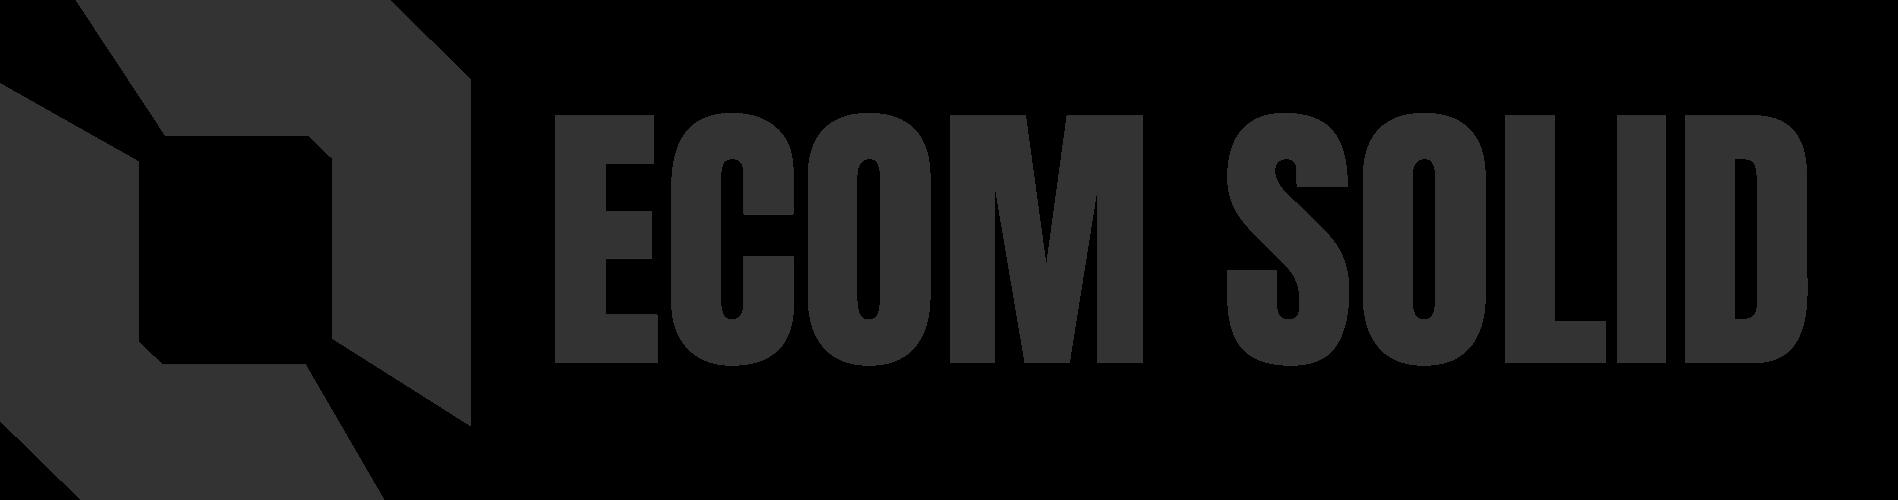 Logo Image Alt Text